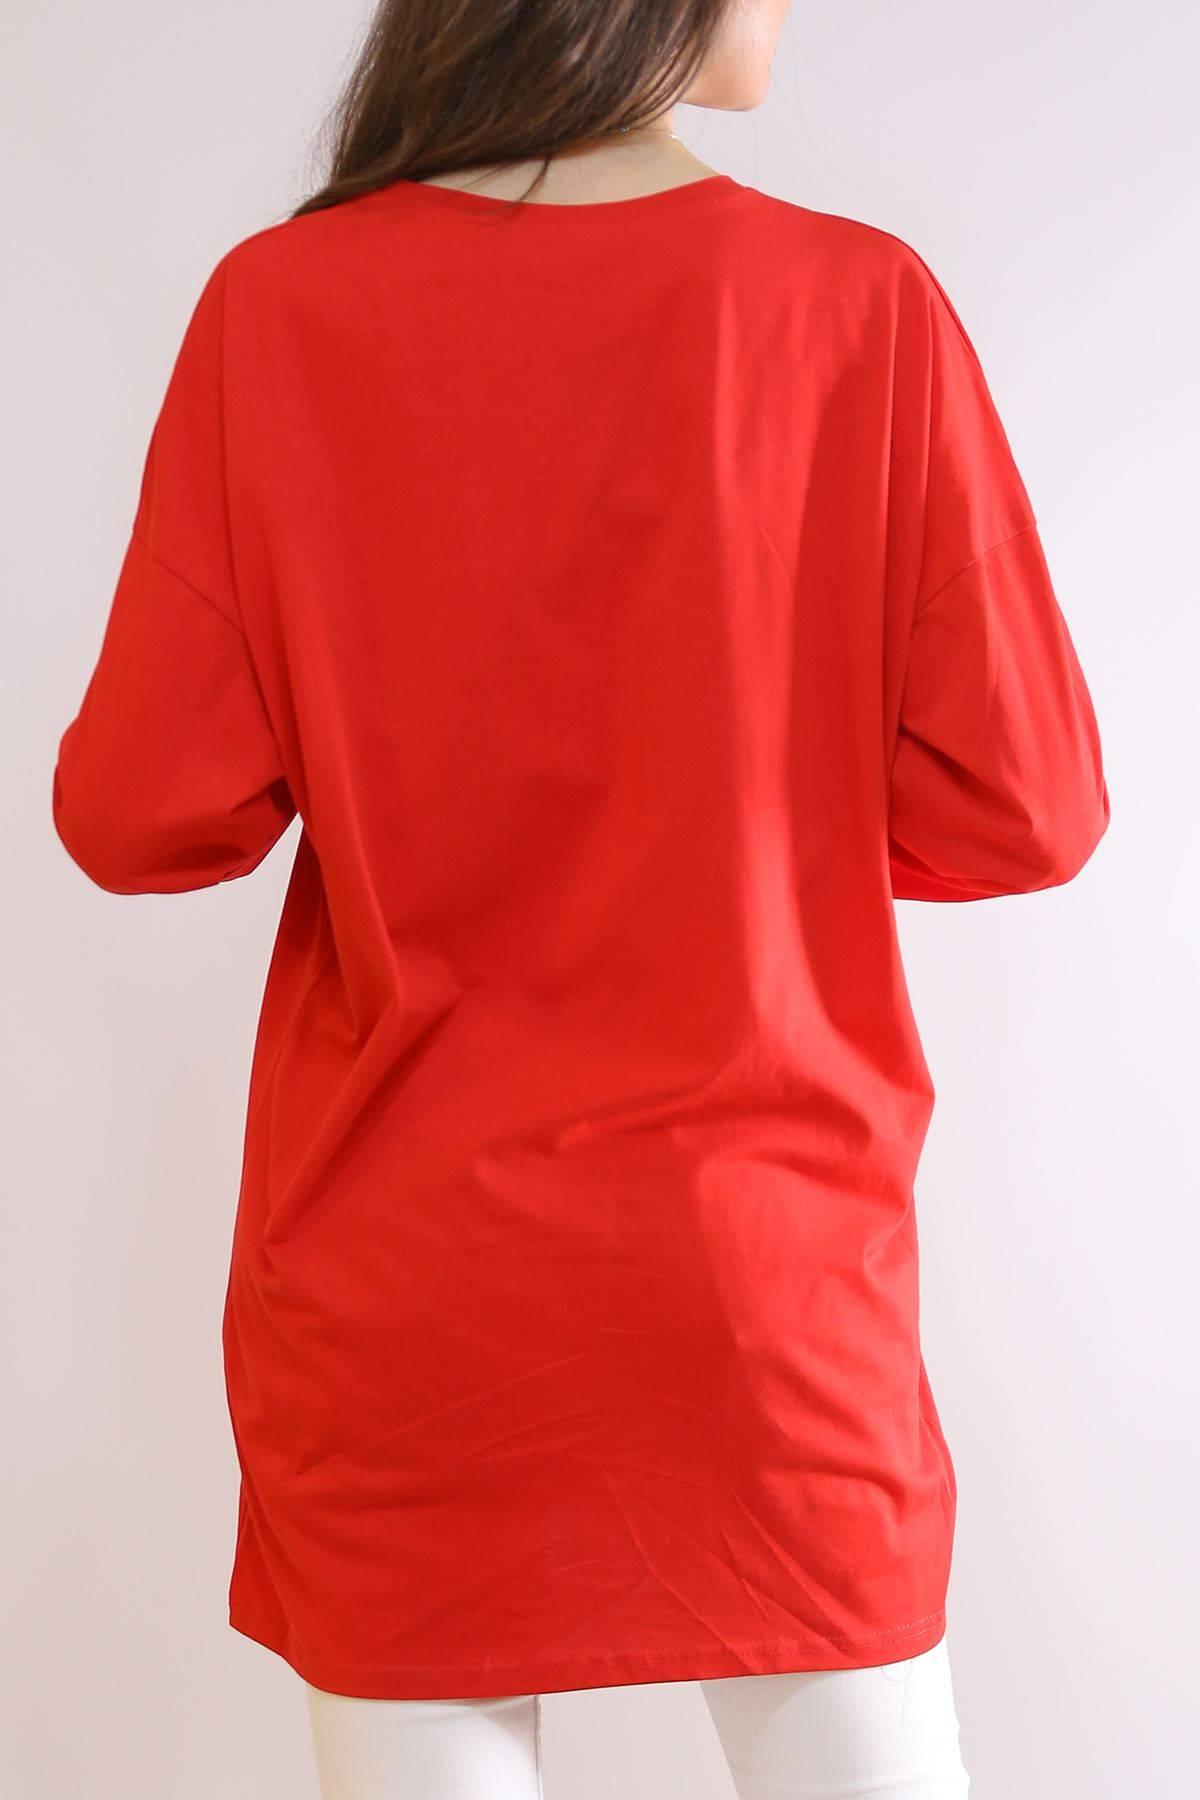 Kapri Kol Tunik Kırmızı - 2216.105.